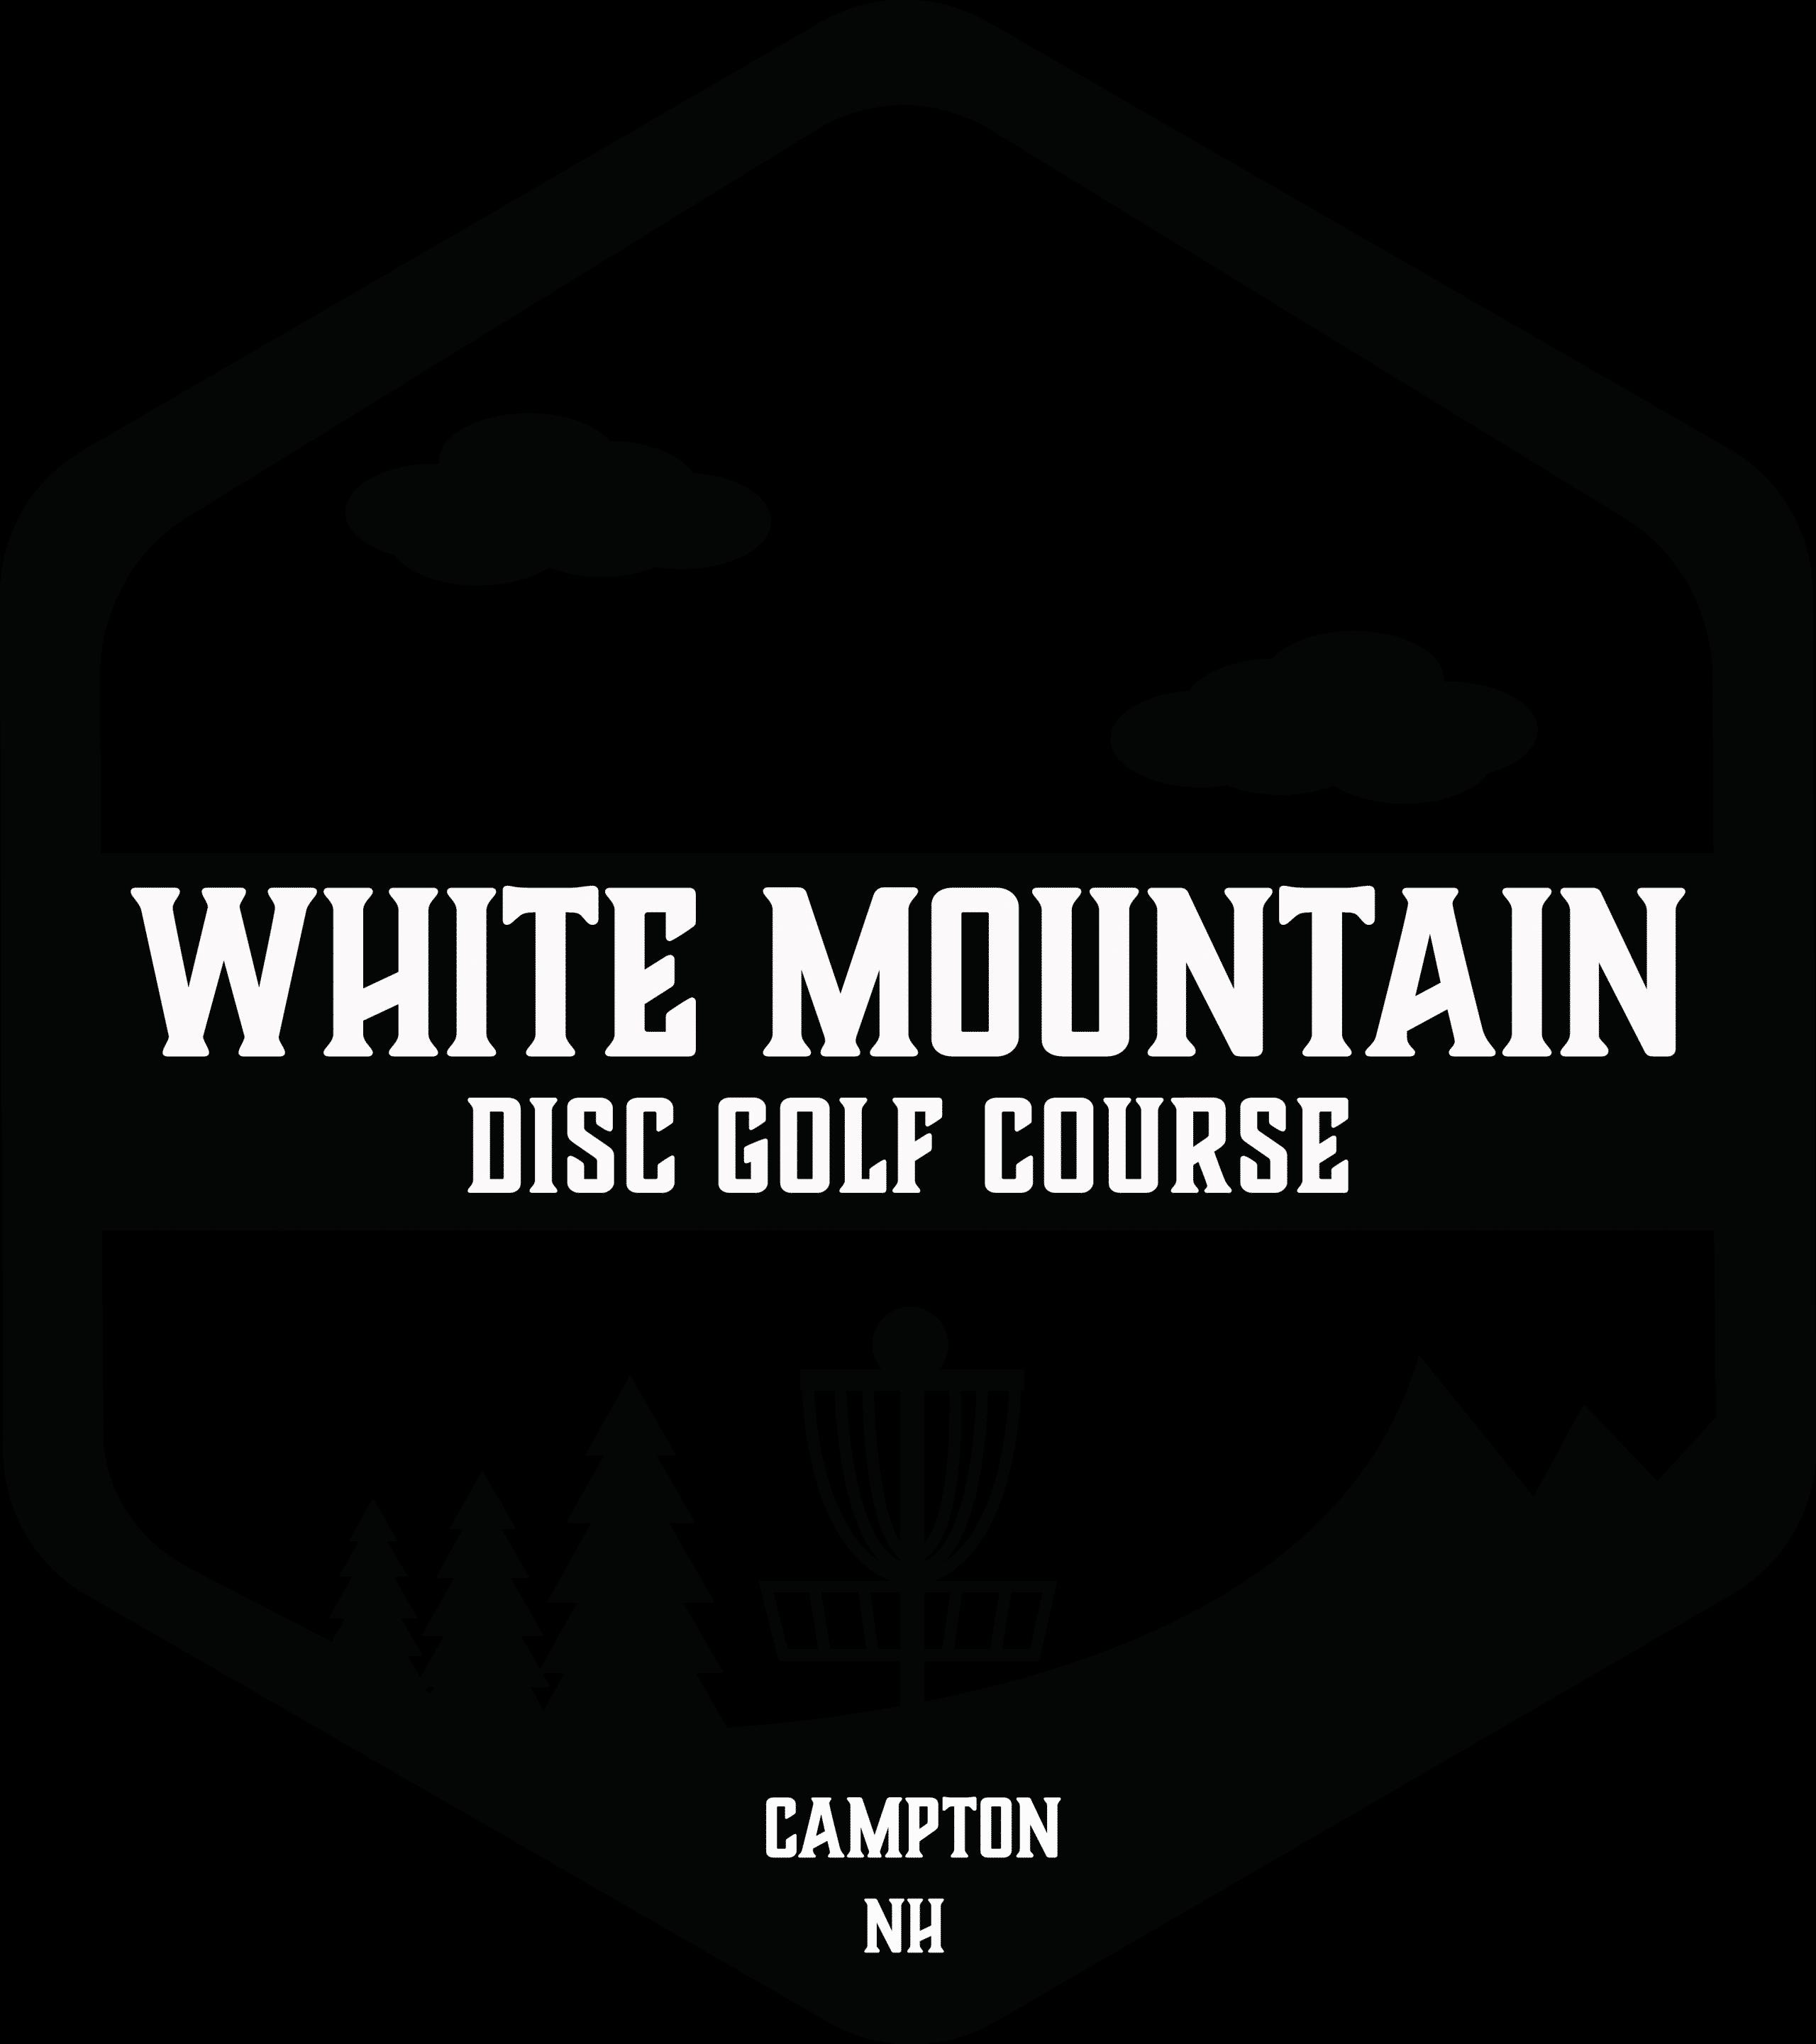 White Mountain Disc Golf Course